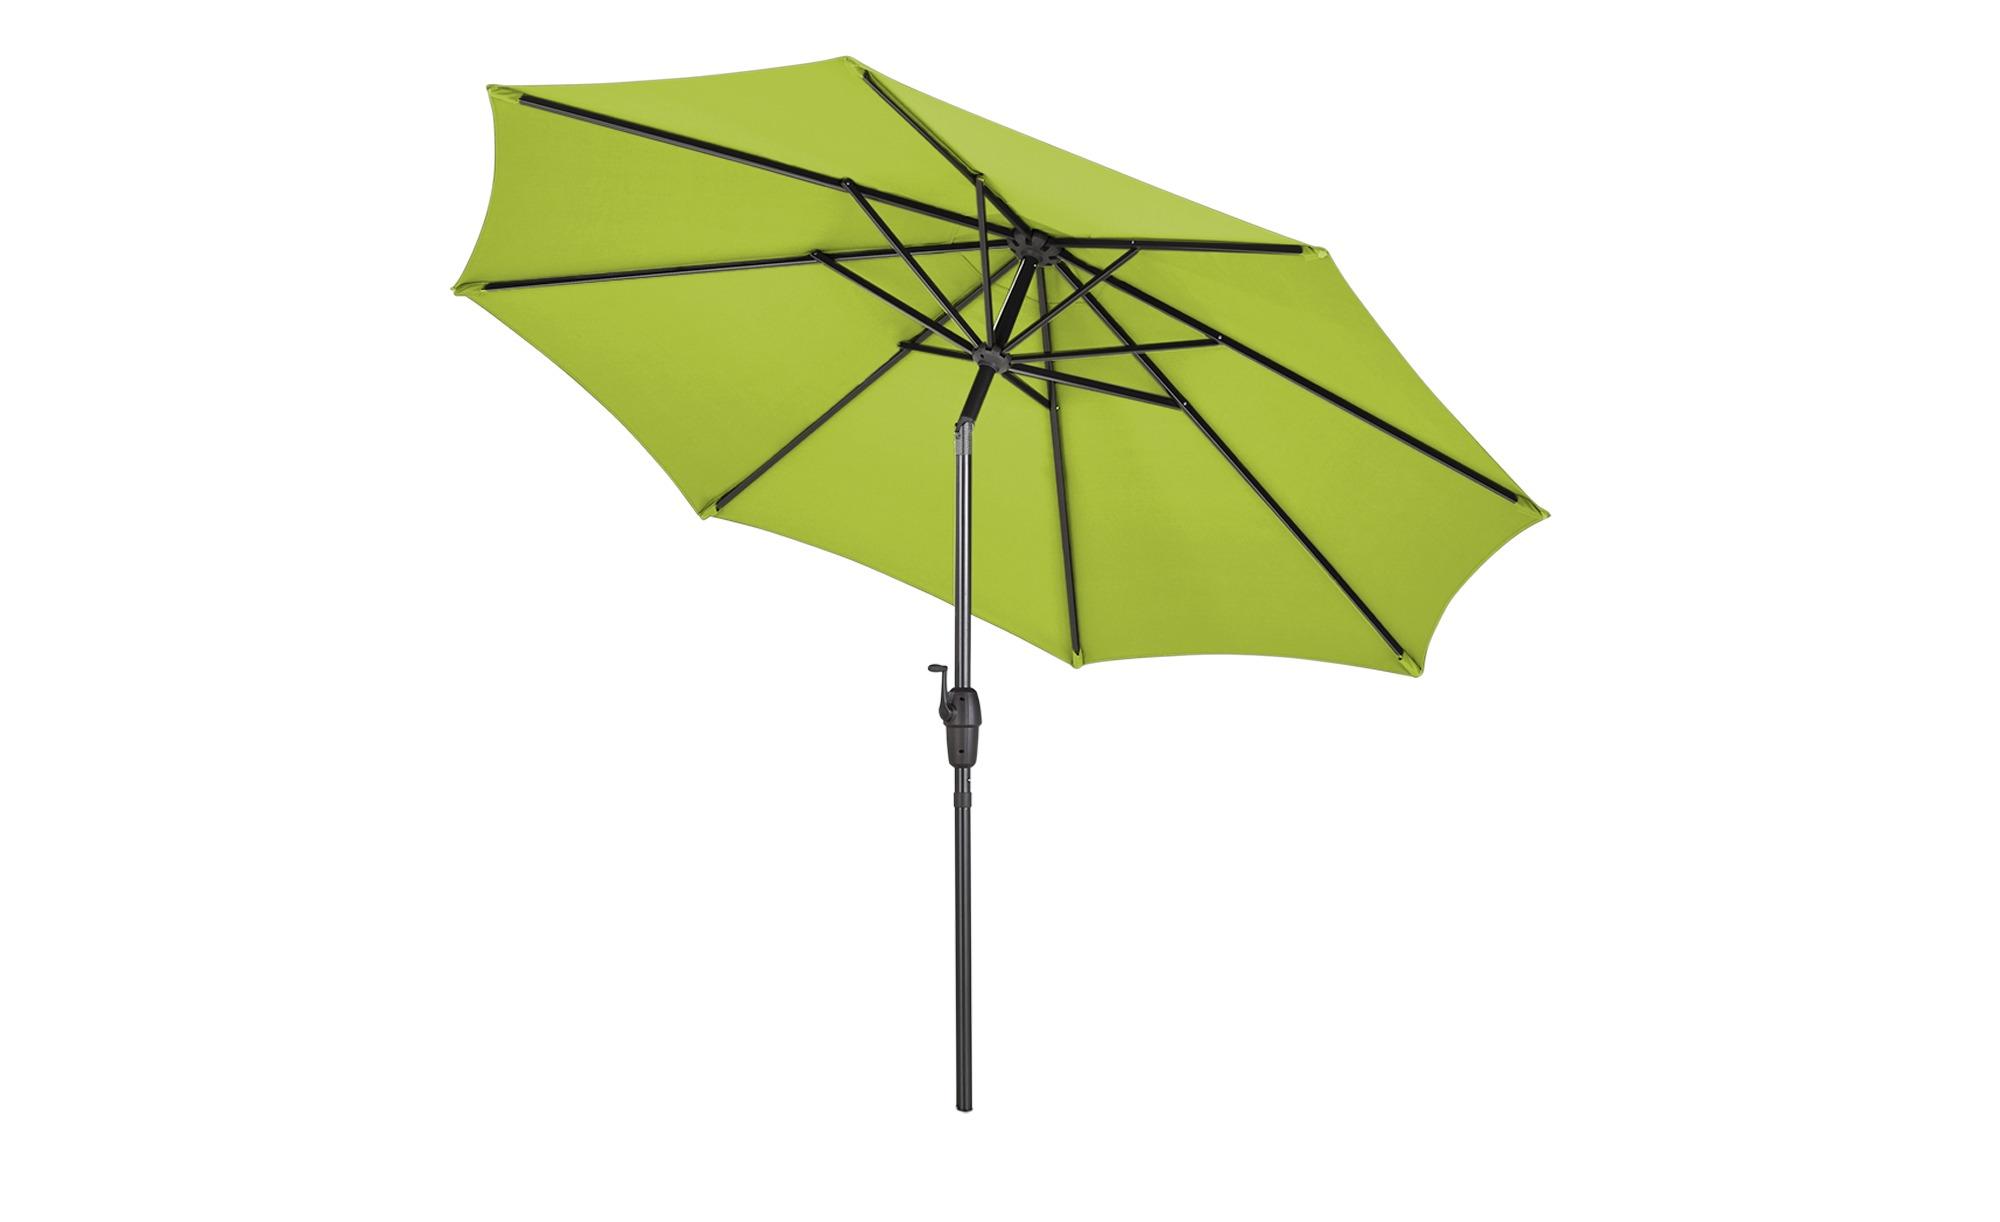 Sonnenschirm - Garten > Sonnenschutz > Sonnenschirme - Möbel Kraft | Garten > Sonnenschirme und Markisen > Sonnenschirme | Möbel Kraft